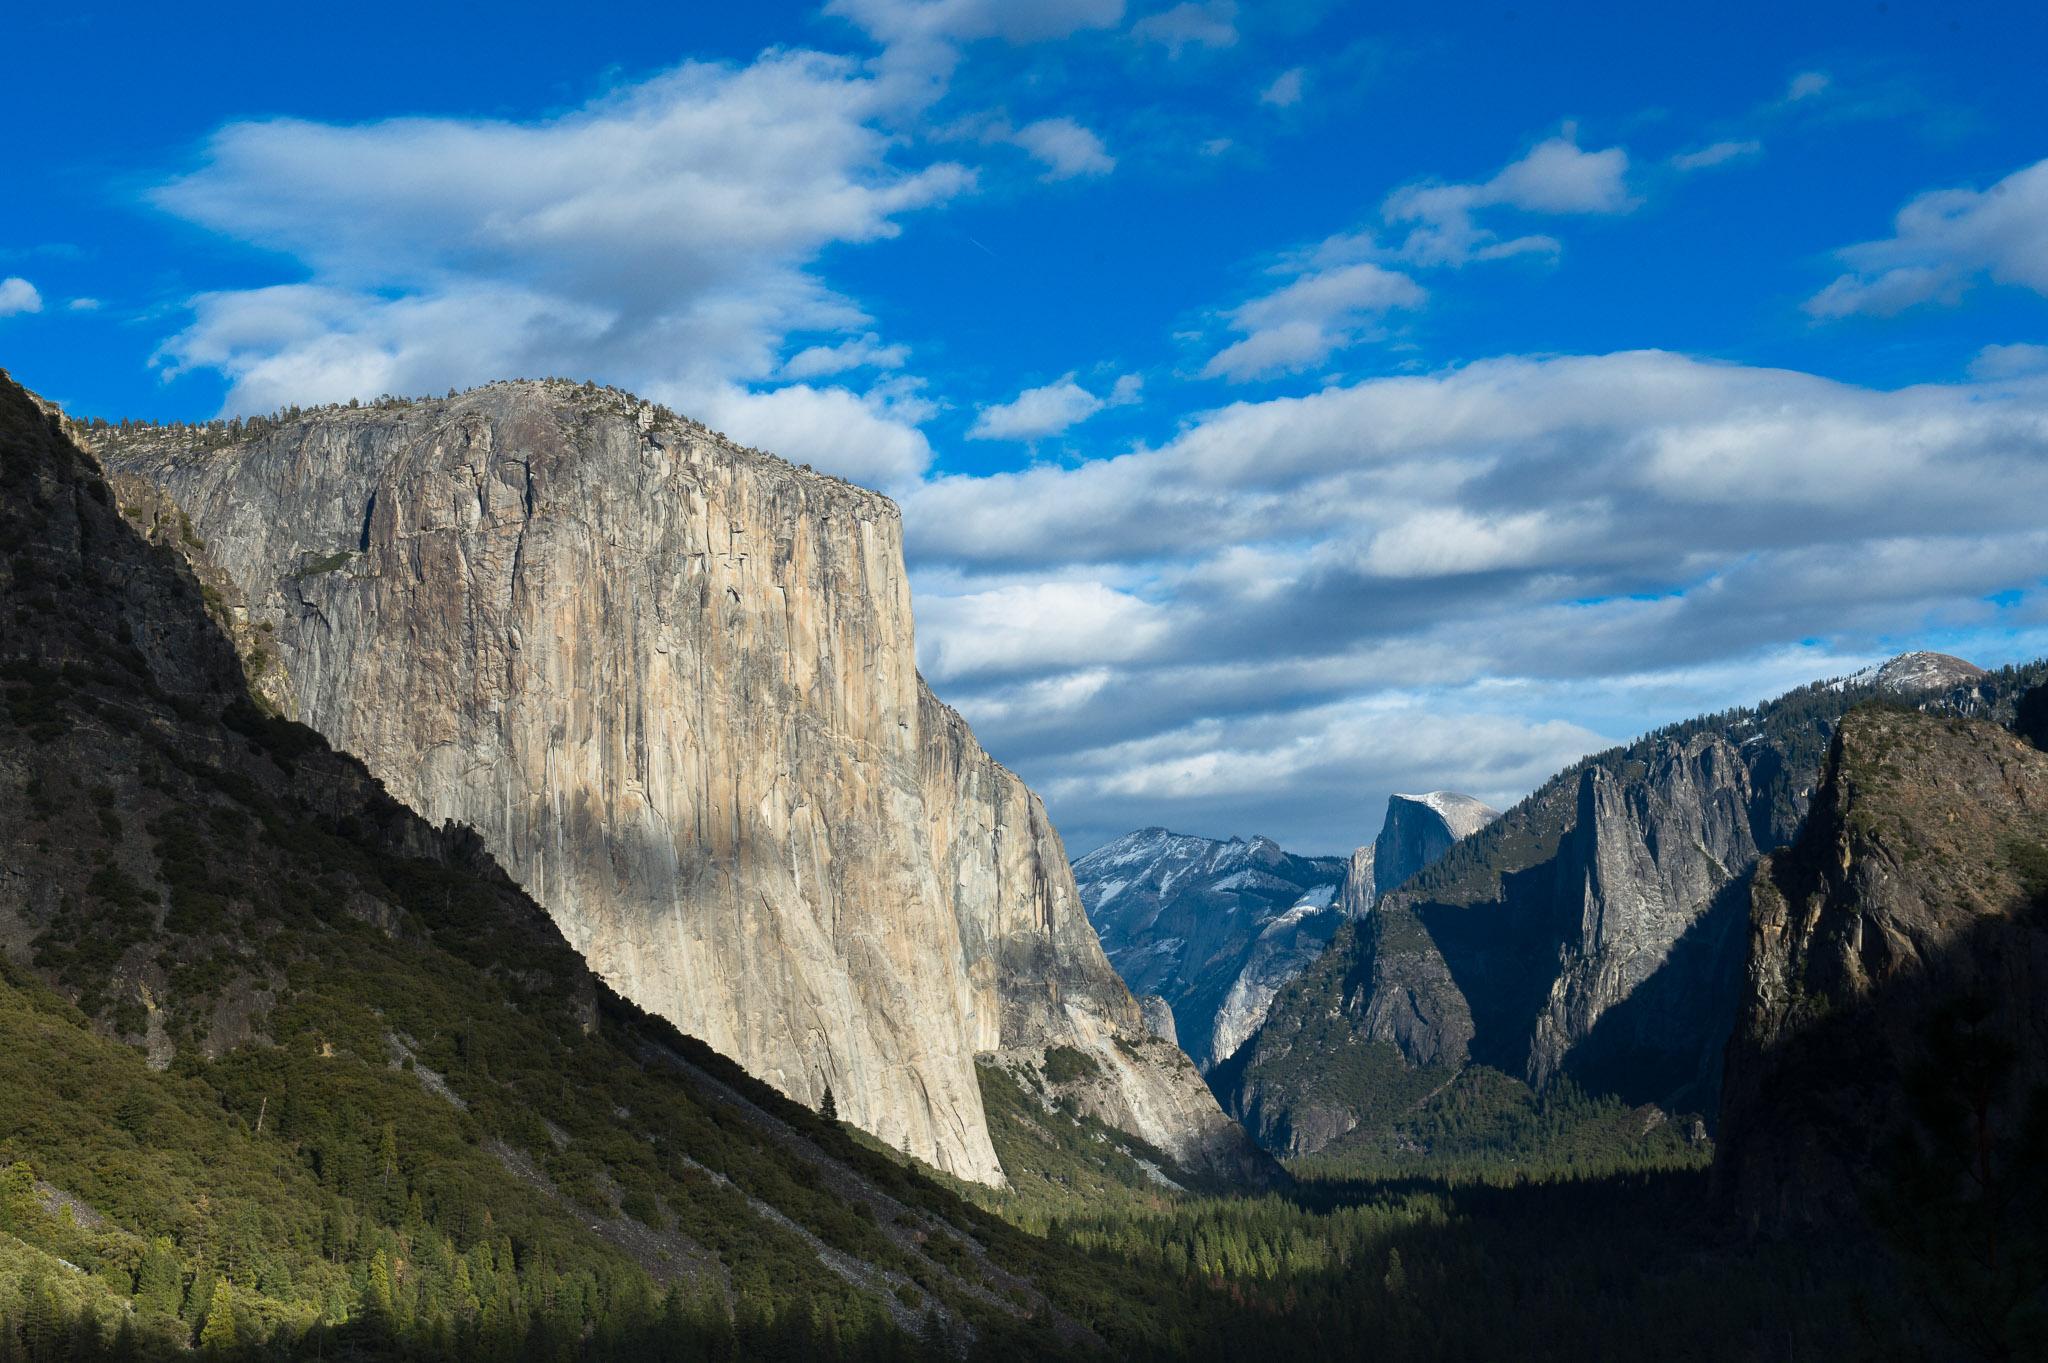 Jason-Davis-Images-Yosemite-0038.jpg